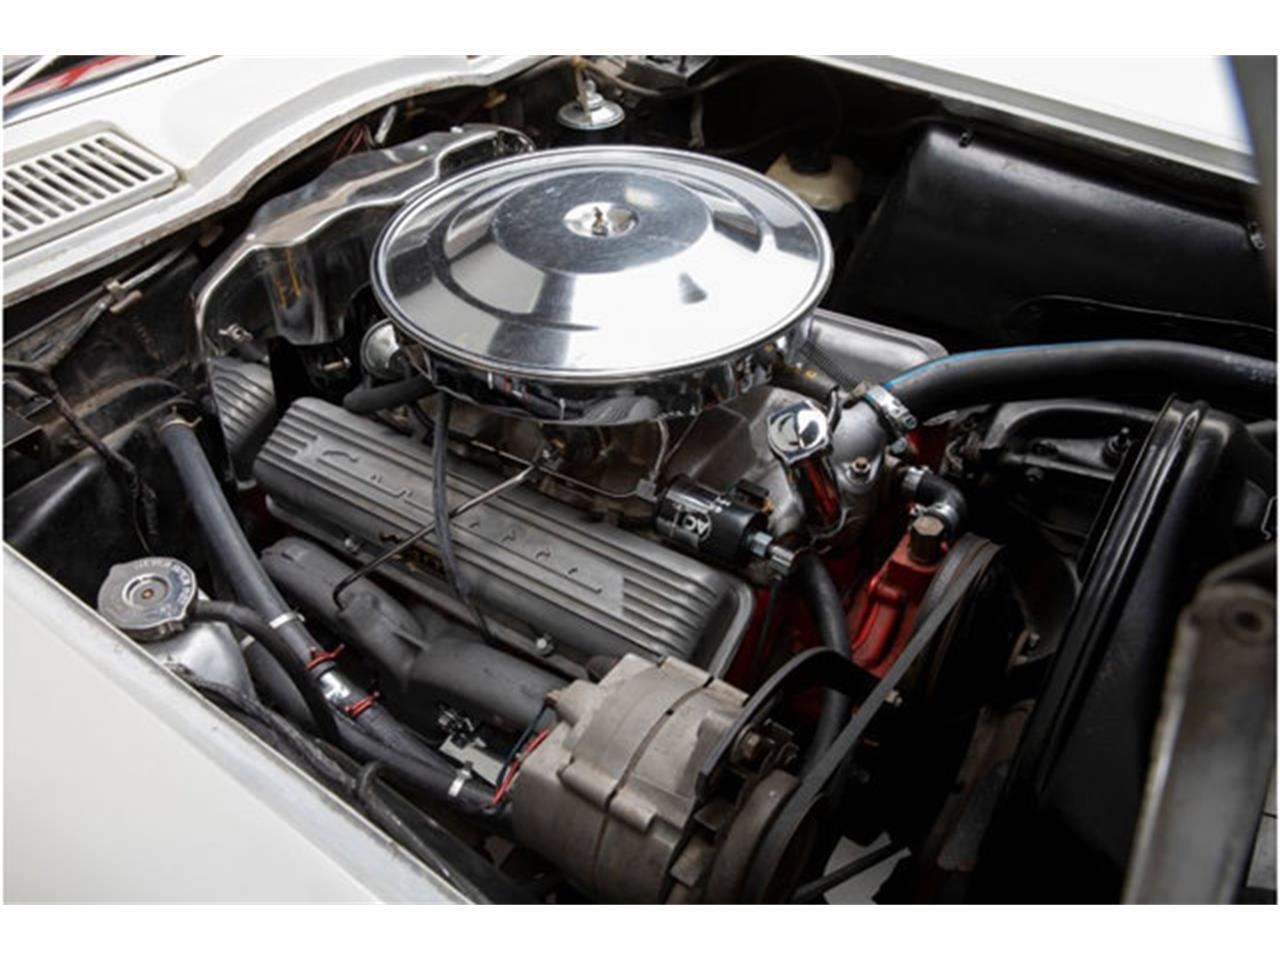 Large Picture of Classic 1963 Chevrolet Corvette located in New York - QOXV